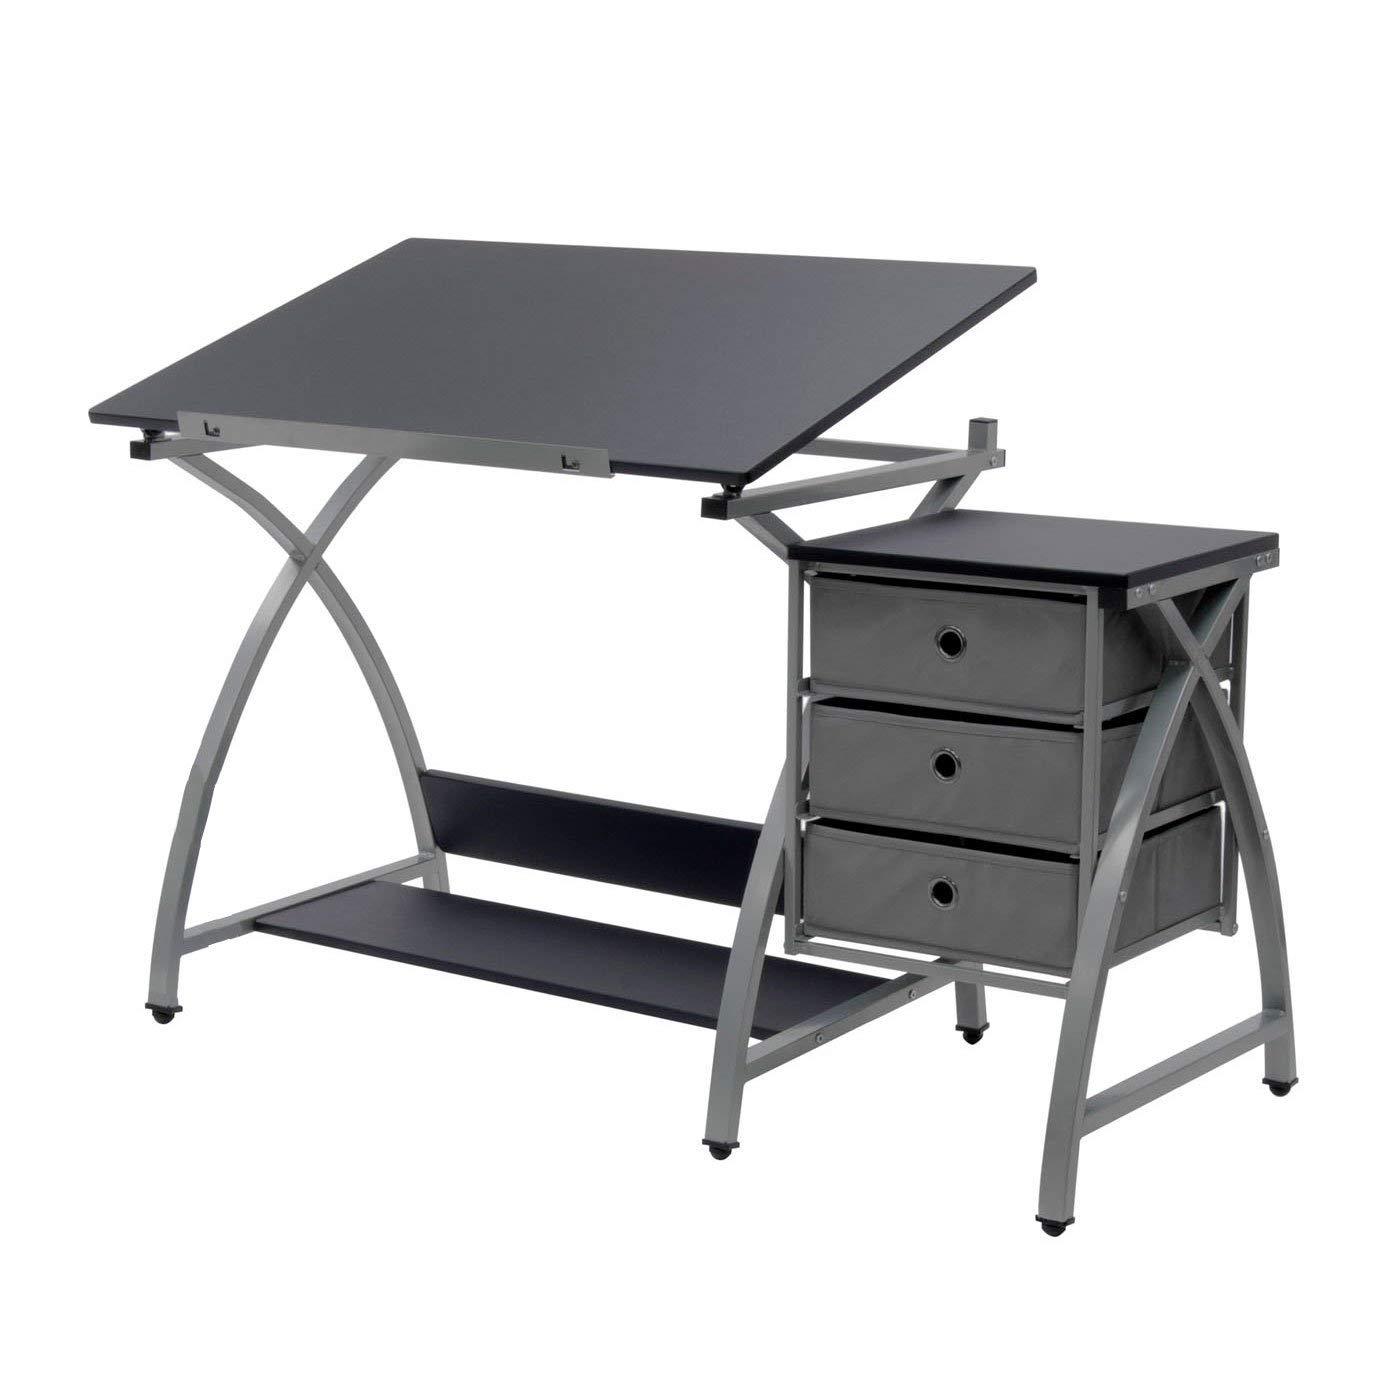 Studio Designs Laminate Craft Table Comet Center with Stool, Black (2 Pack) by STUDIO DESIGNS INSPIRING CREATIVITY WWW.STUDIODESIGNS.COM (Image #4)